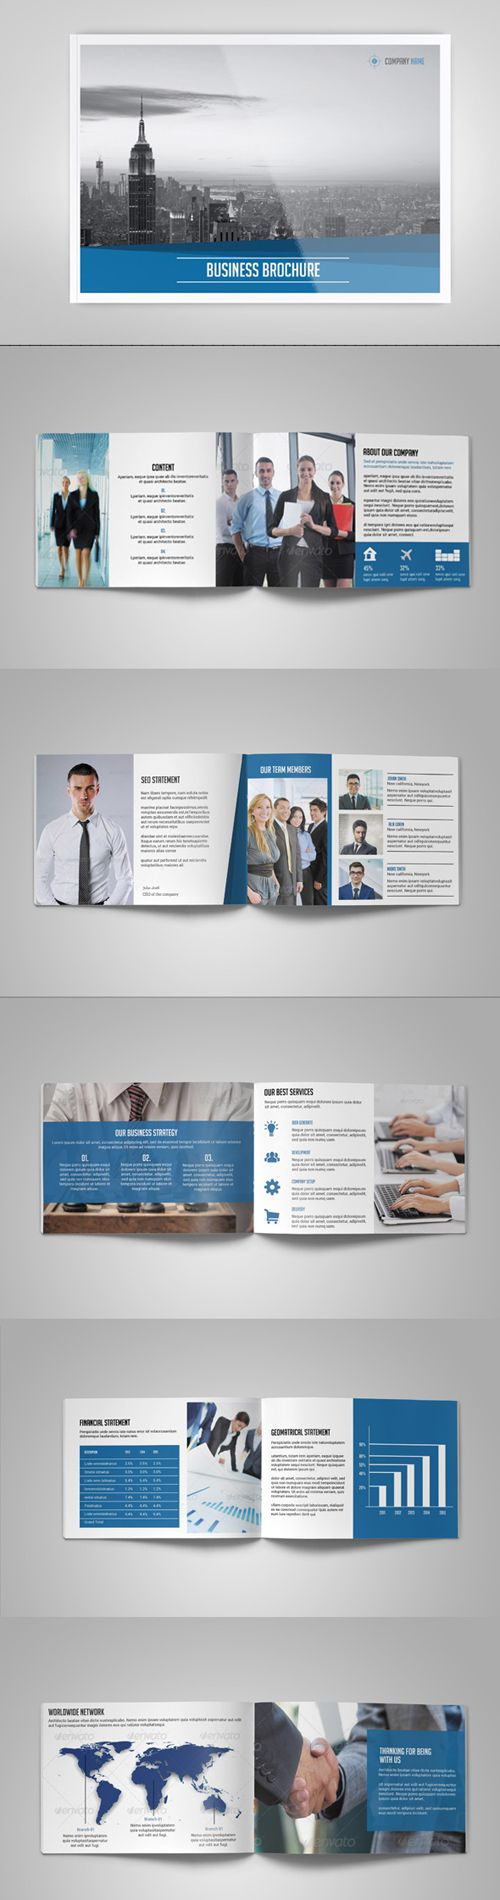 100 best brochure design images on pinterest brochure template business brochure catalog template booklet brochuredesign brochuretemplates catalogdesign cheaphphosting Images